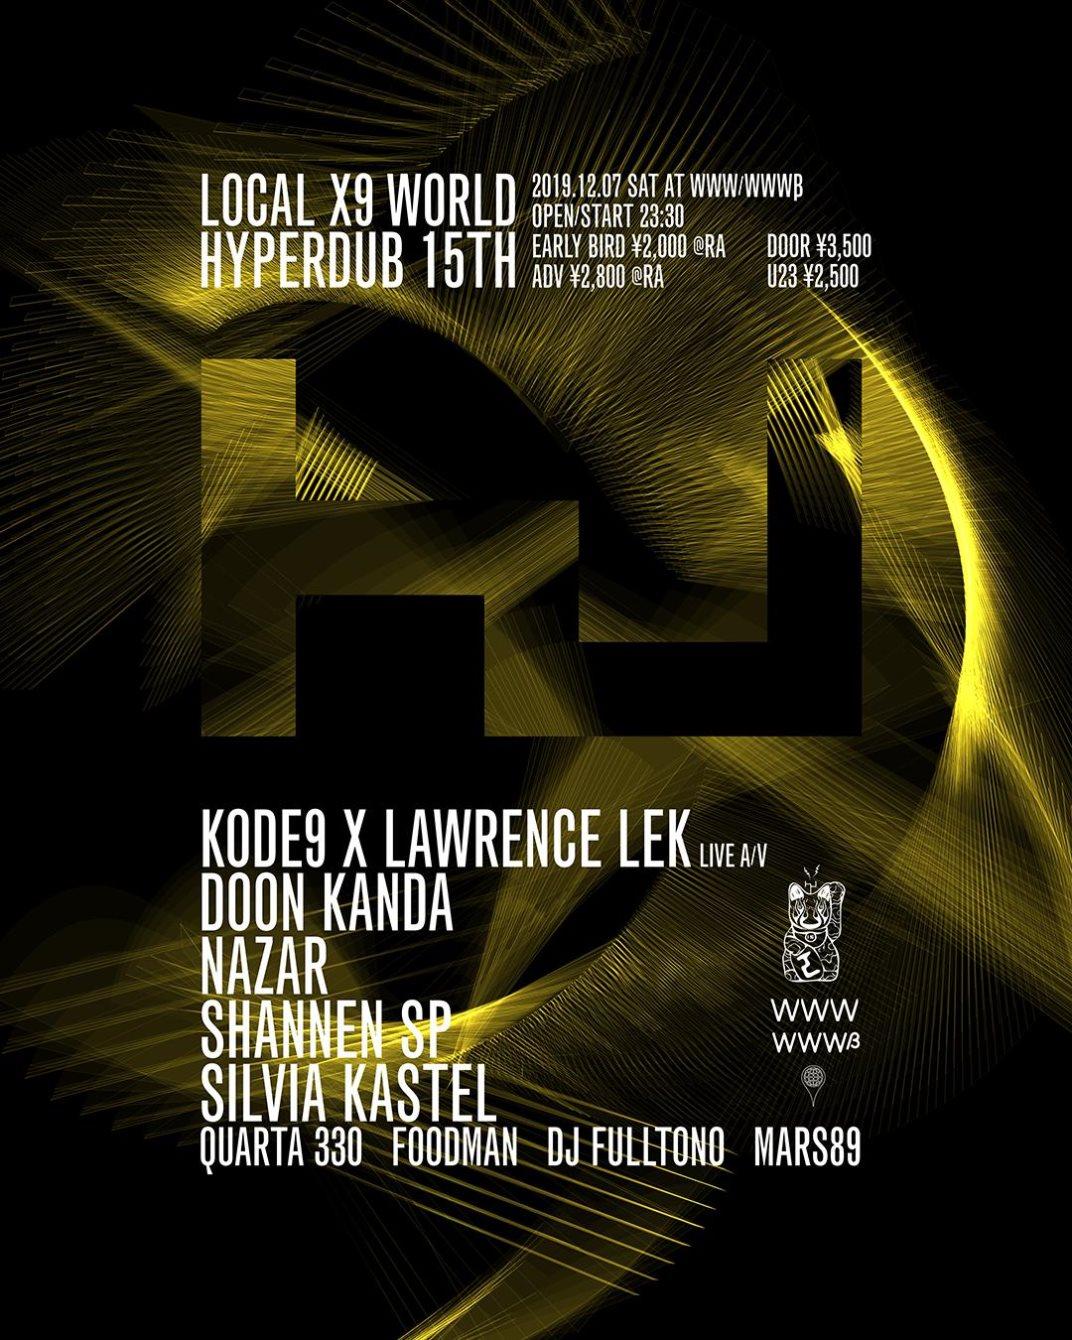 Local X9 World Hyperdub 15th - Flyer front